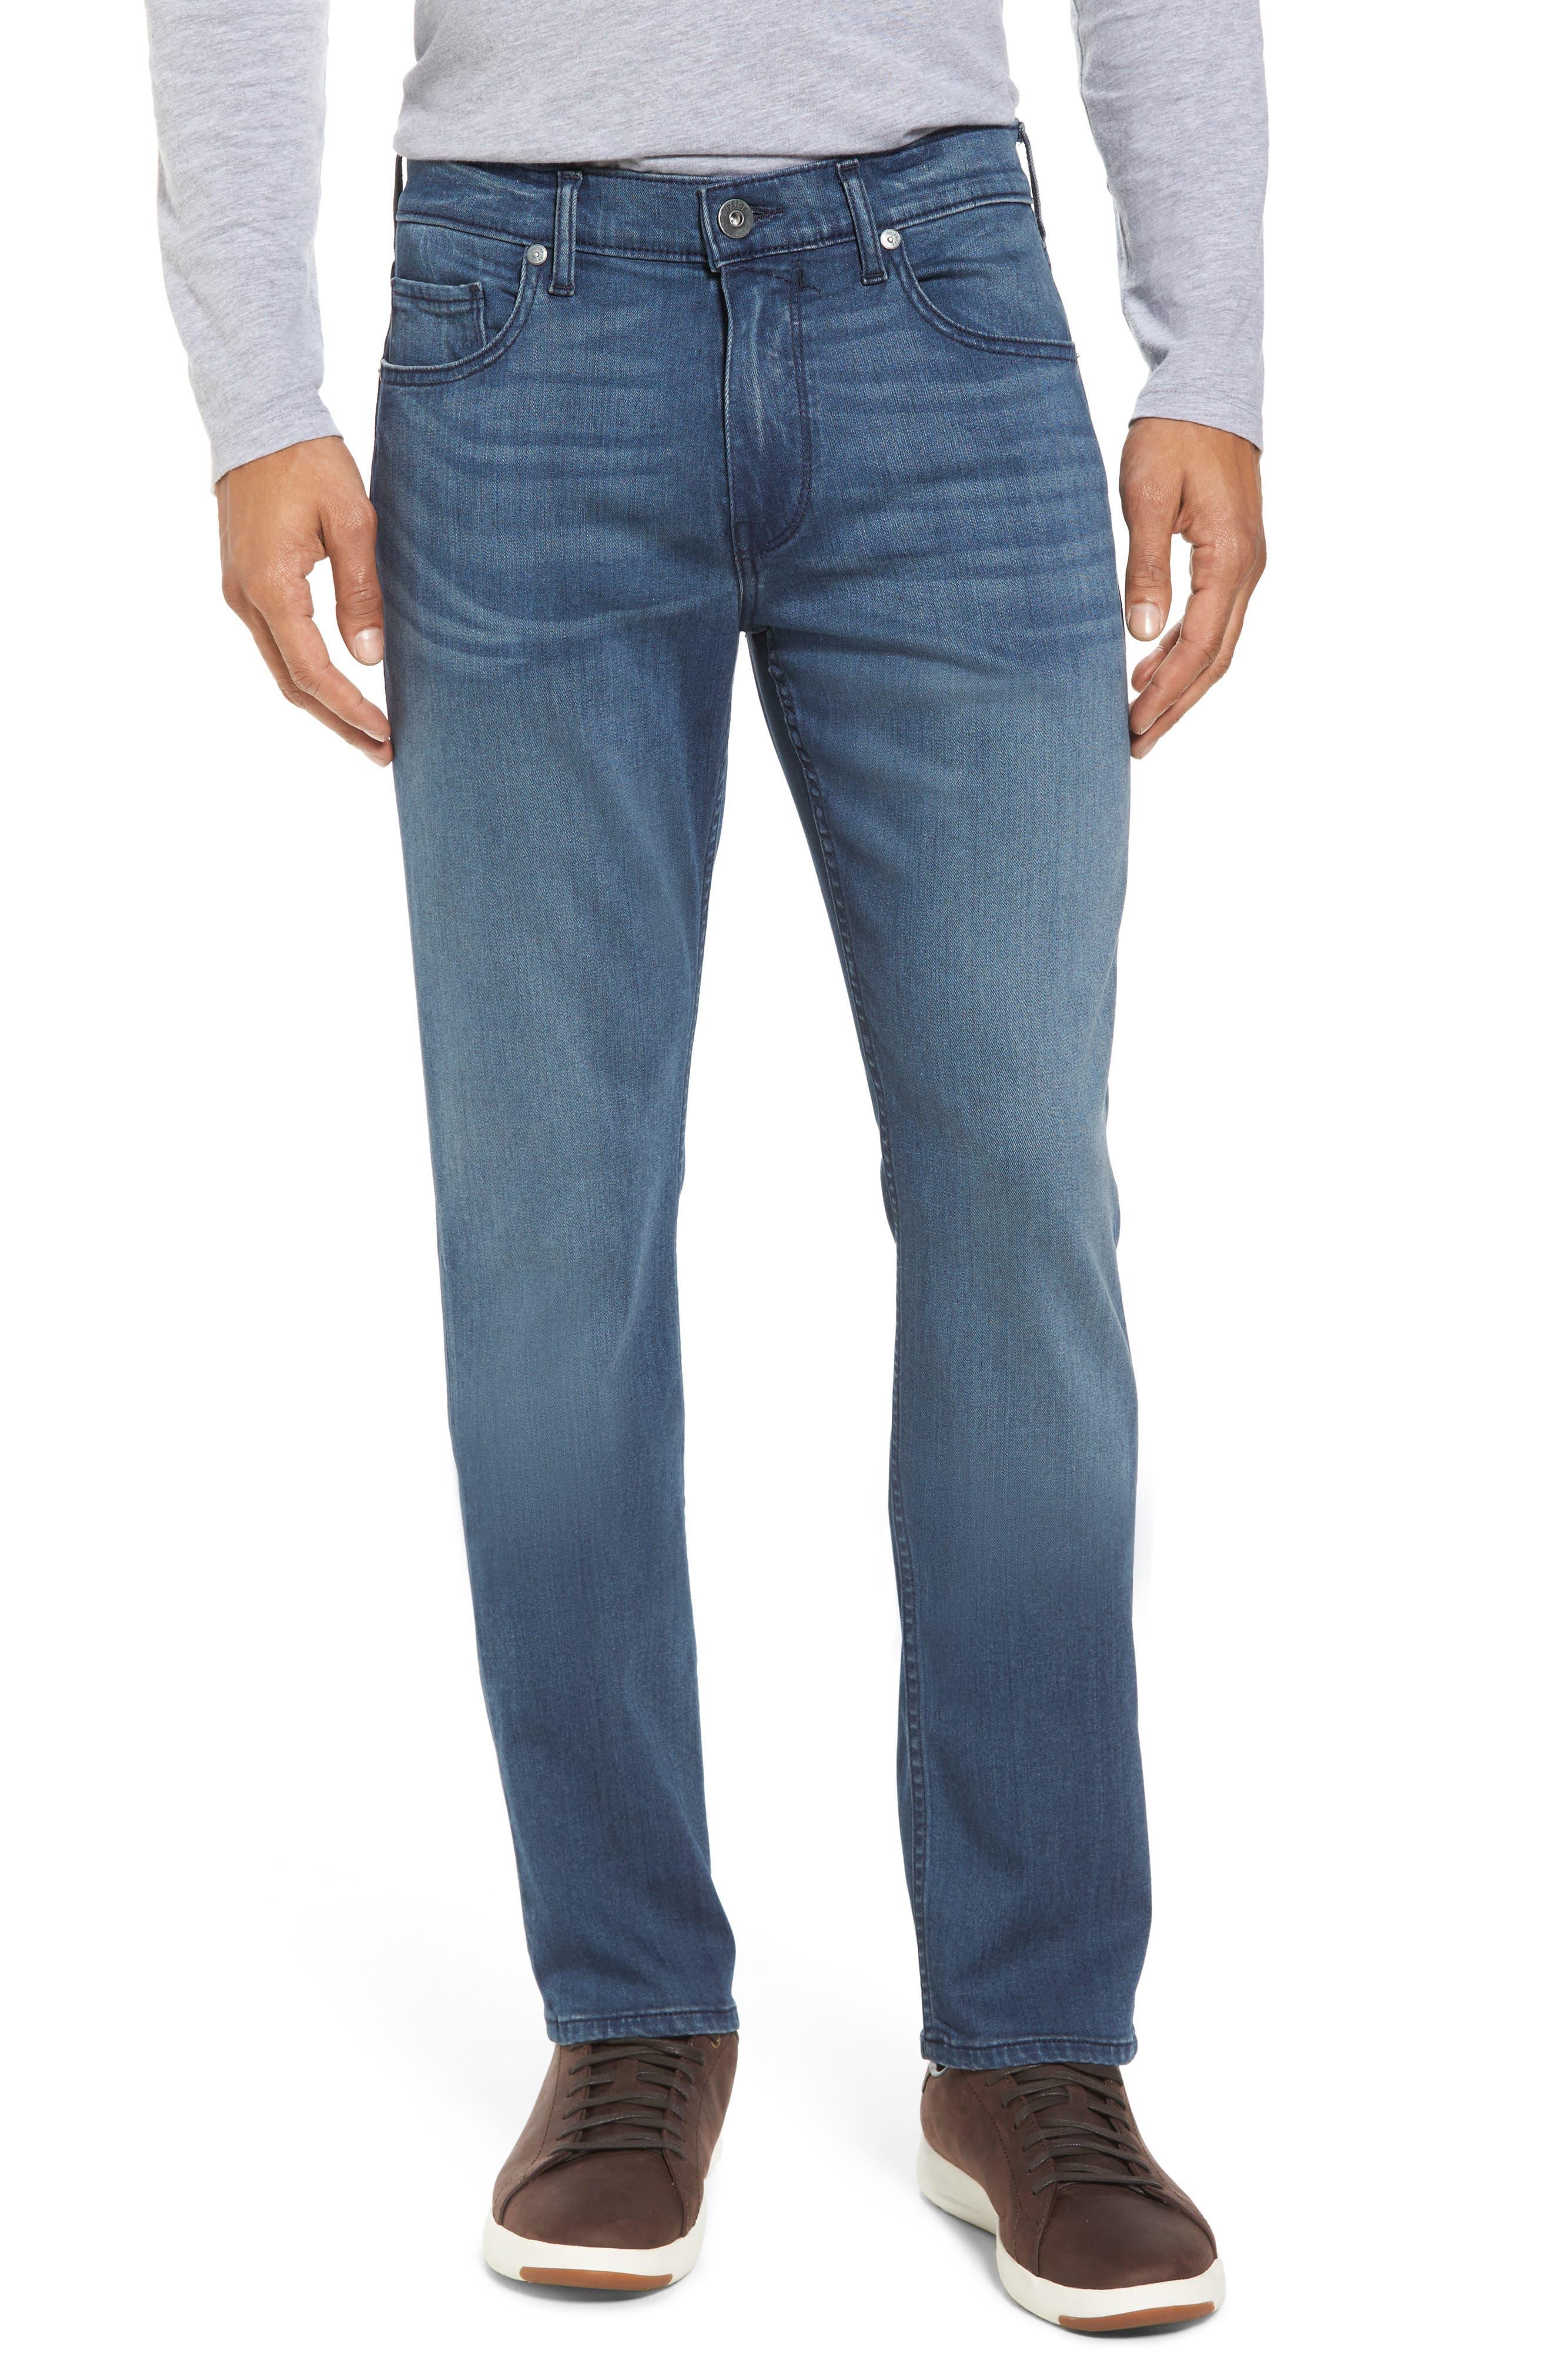 Transcend - Federal Slim Straight Fit Jeans,                         Main,                         color, 400